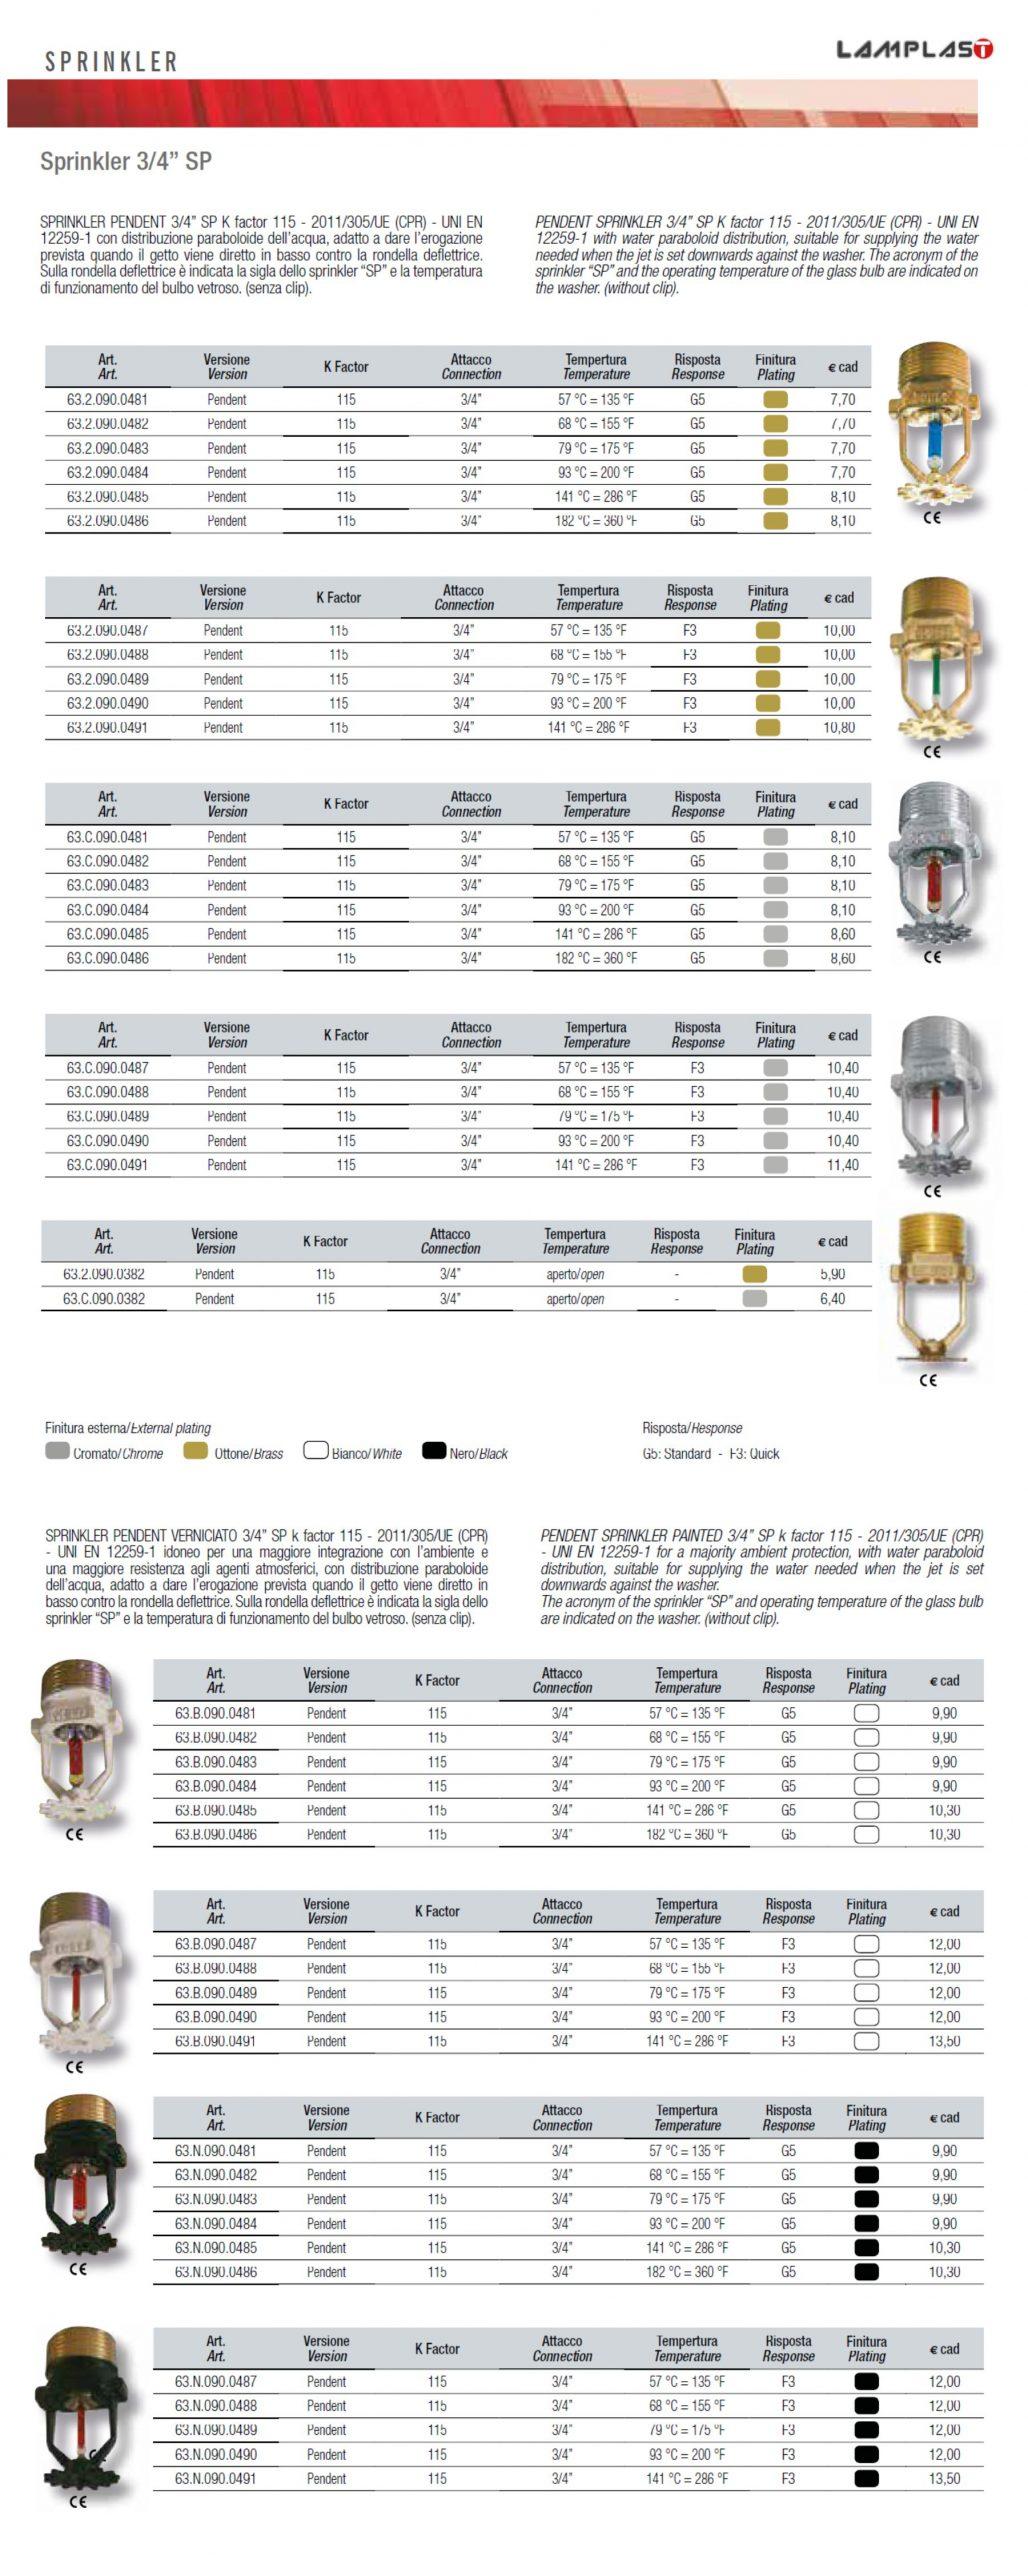 SPRINKLER 34 SP - ANTINCENDIO - LAMPLAST - FERMO - MARCHE - LIST2104